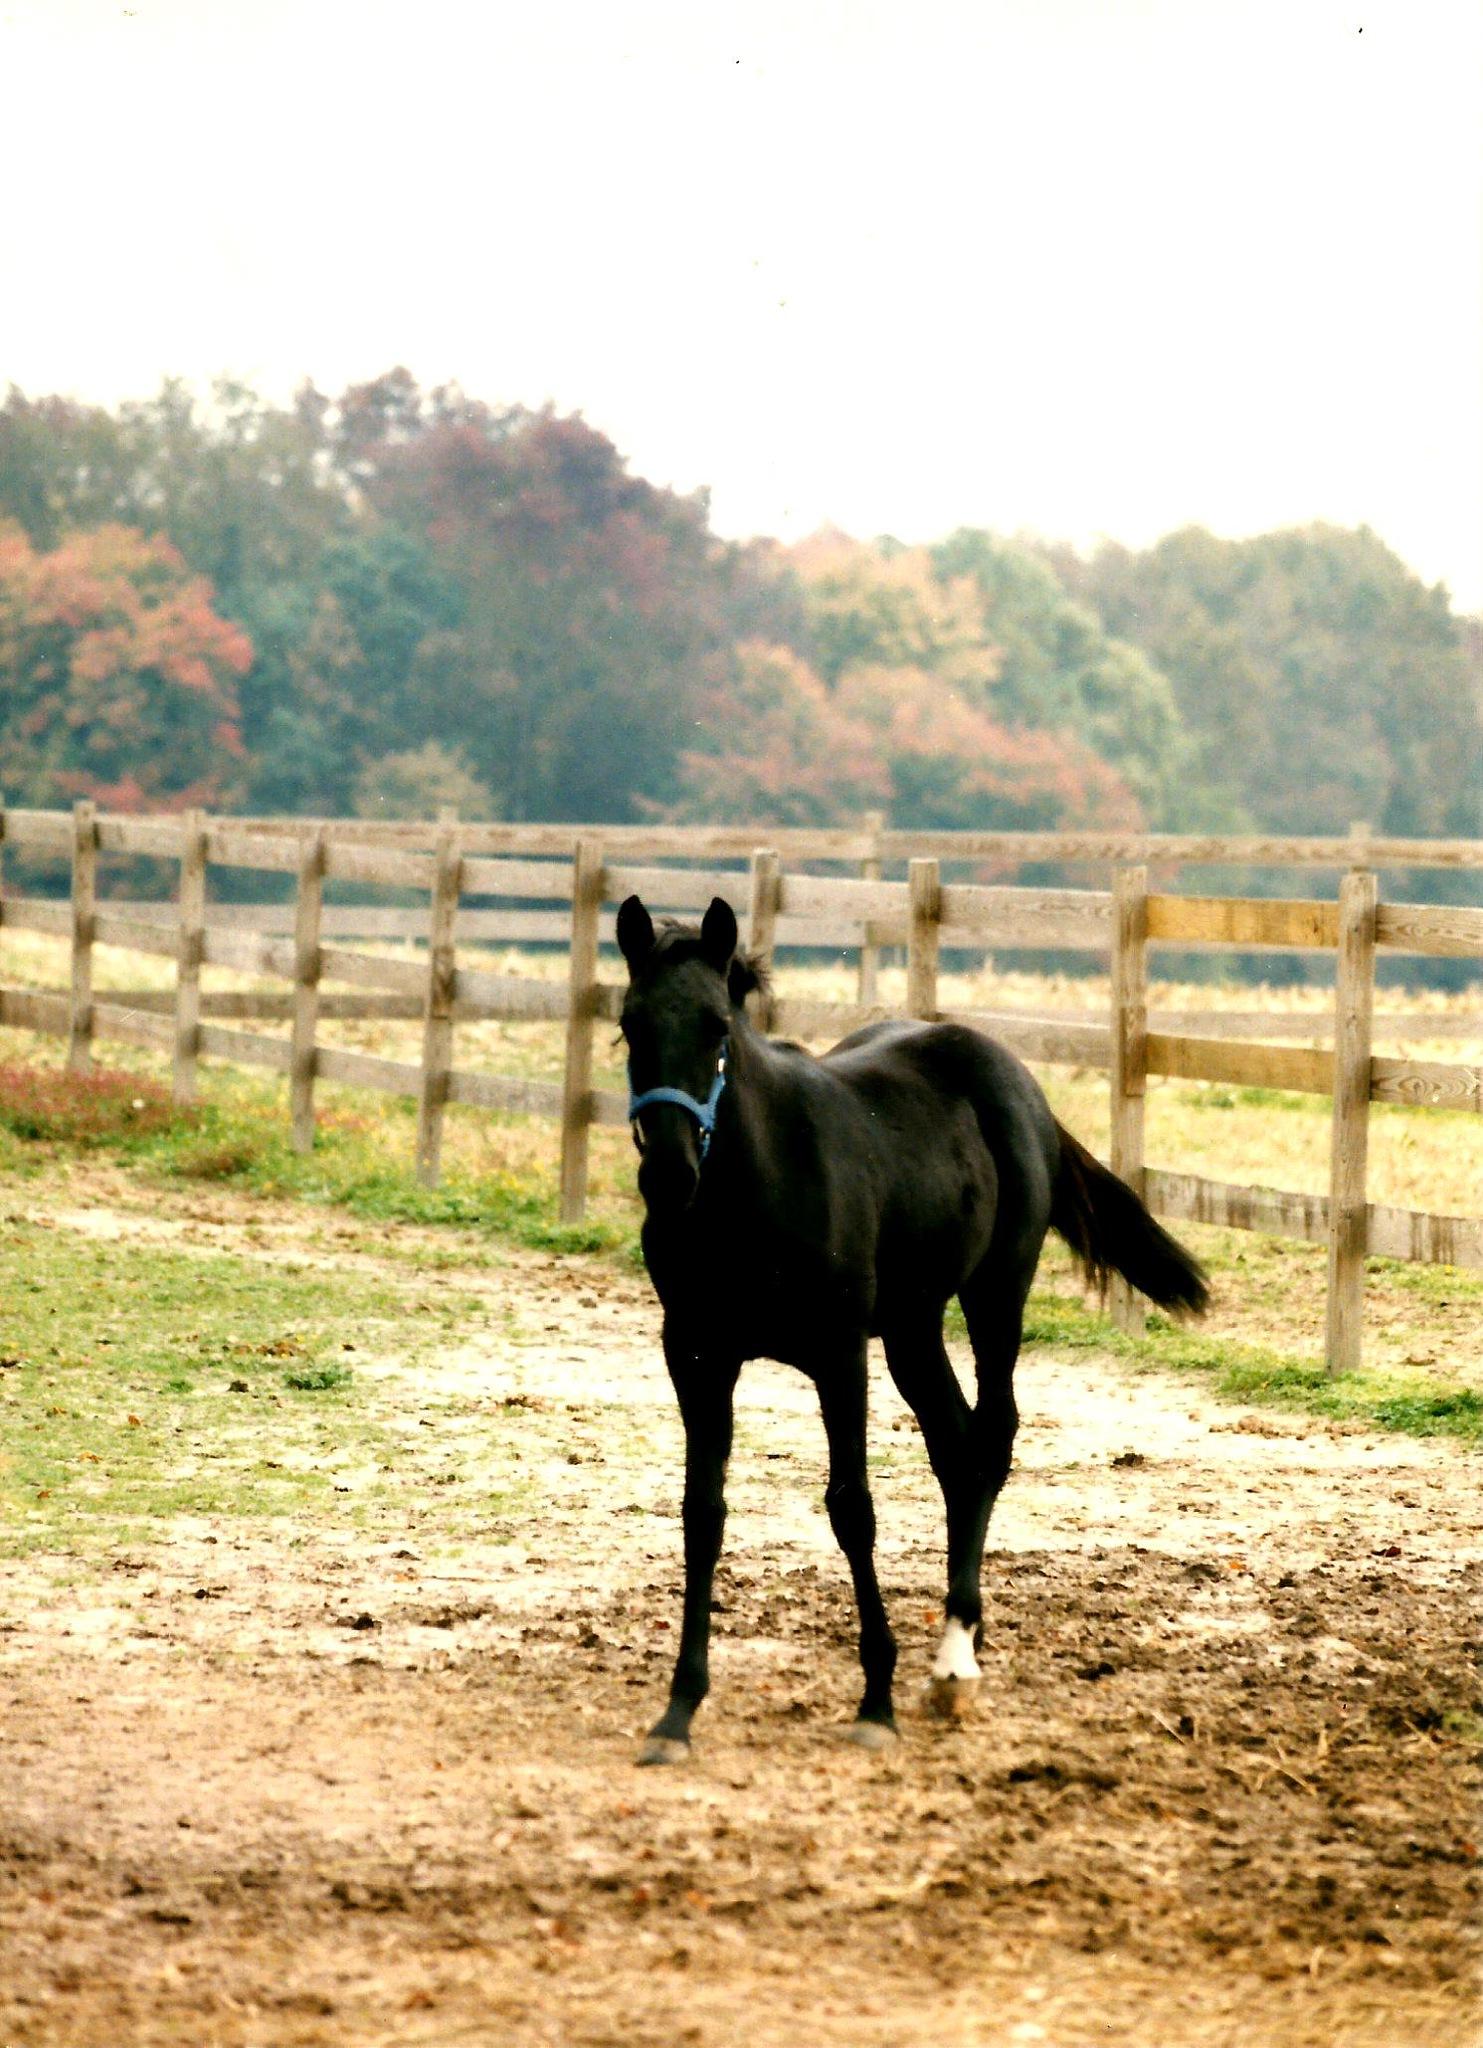 BLACK VELVET THE COLT by Hope Atwood Dayhoff